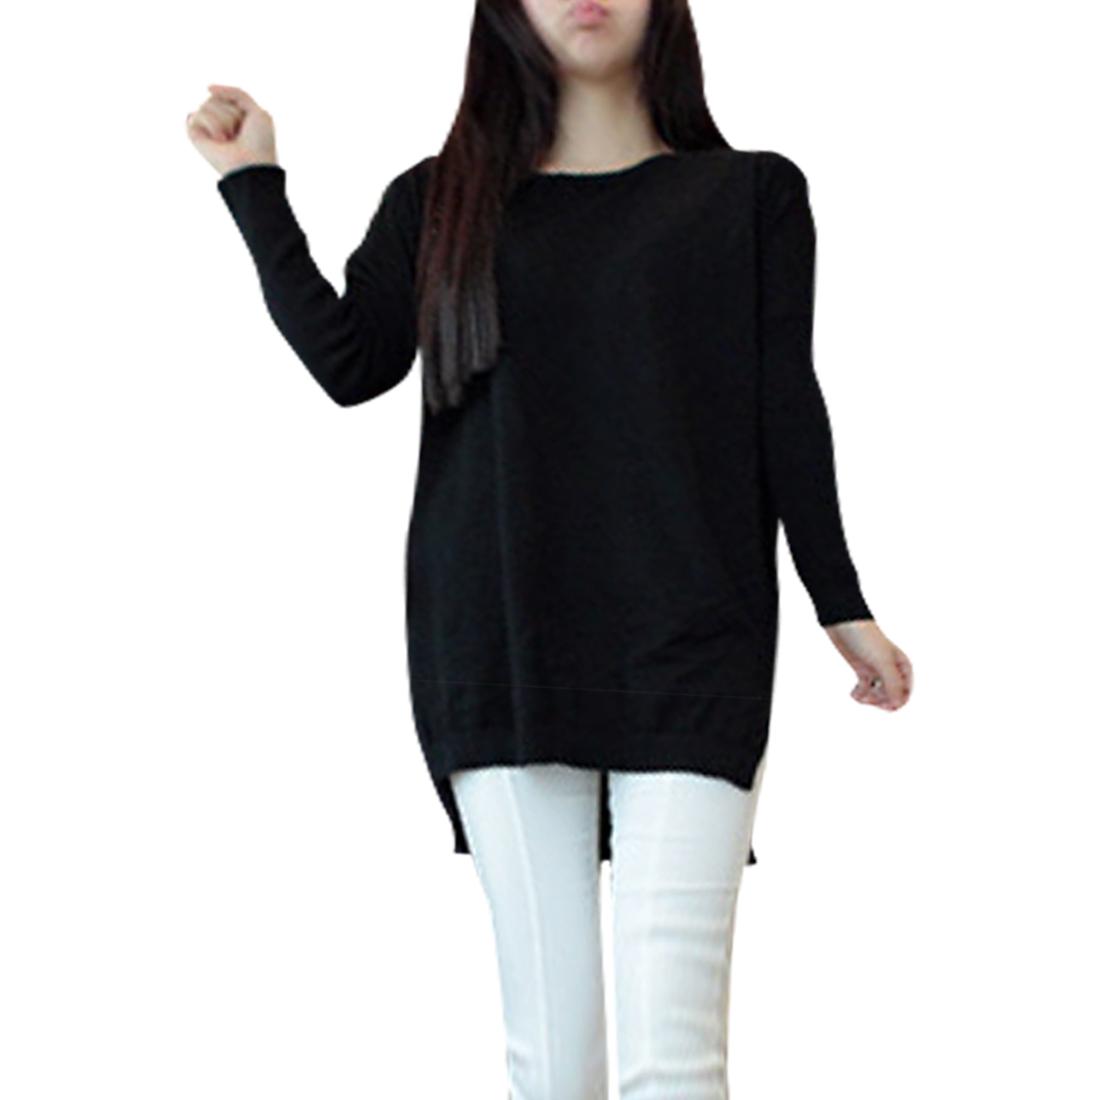 Women Pullover Batwing Sleeves Black Knit Tunic Shirt XS